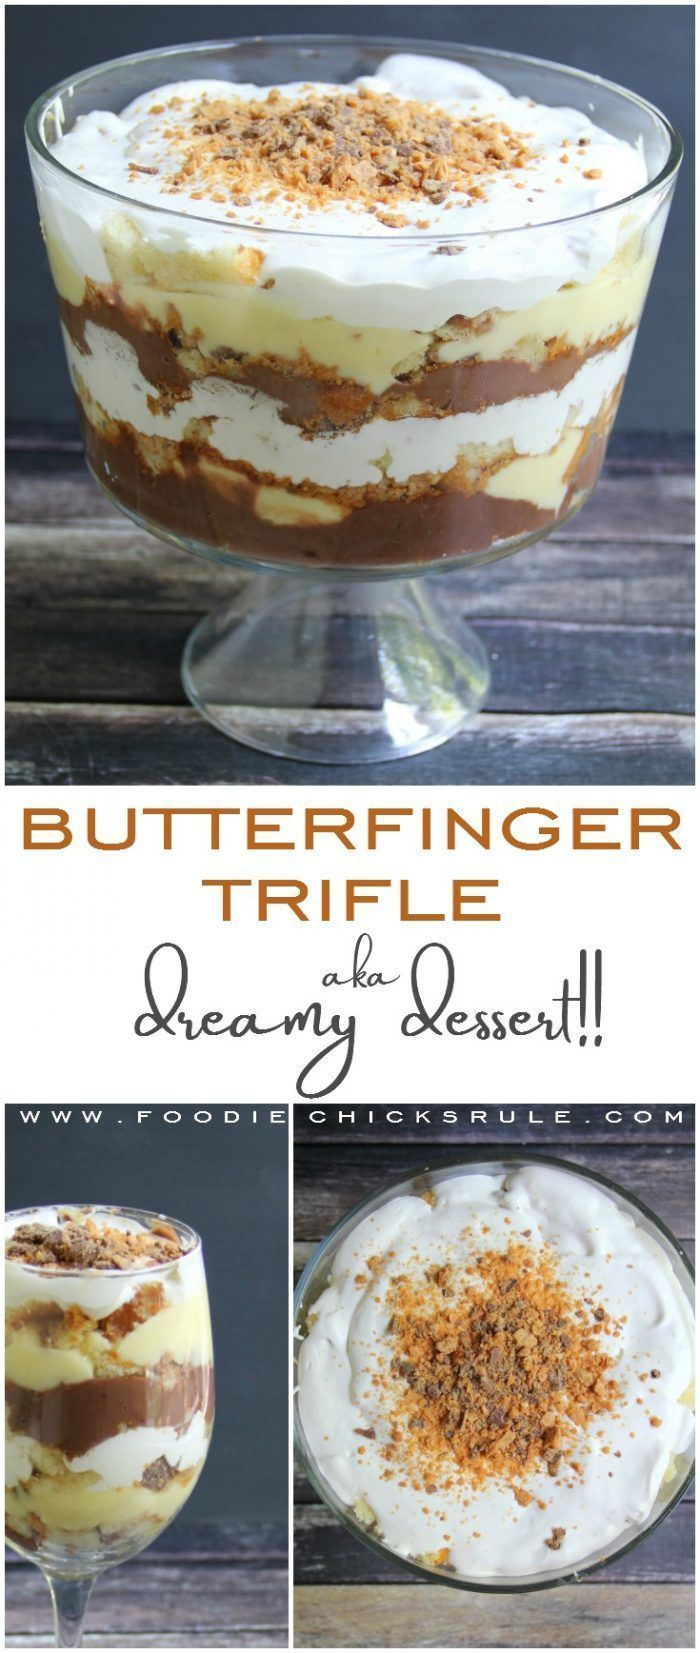 Butterfinger Trifle (aka Dreamy Dessert) #trifledesserts